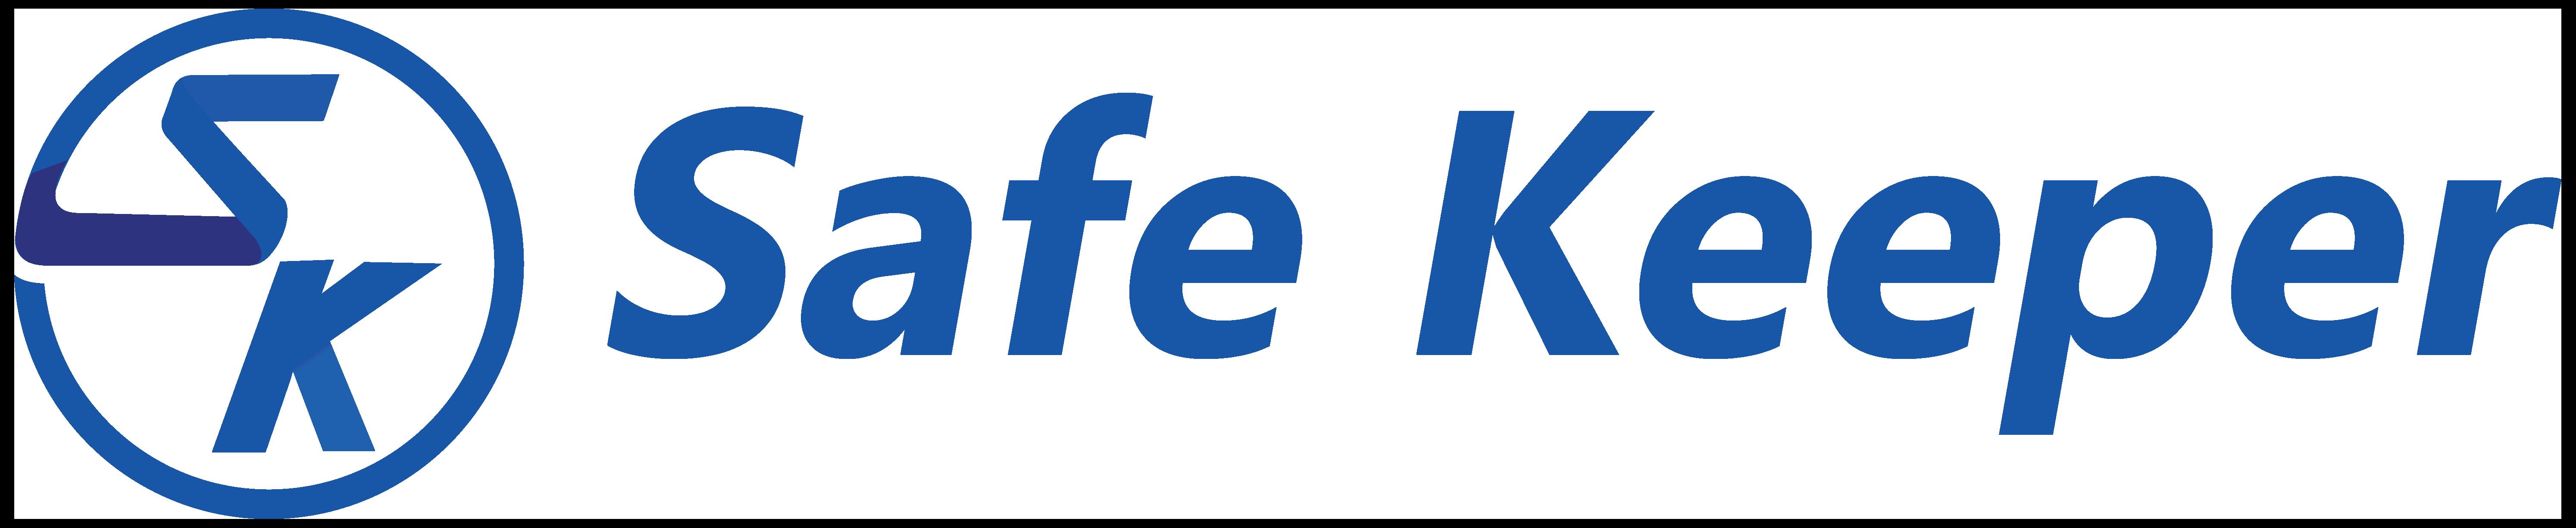 Safe Keeper   Safe Climber